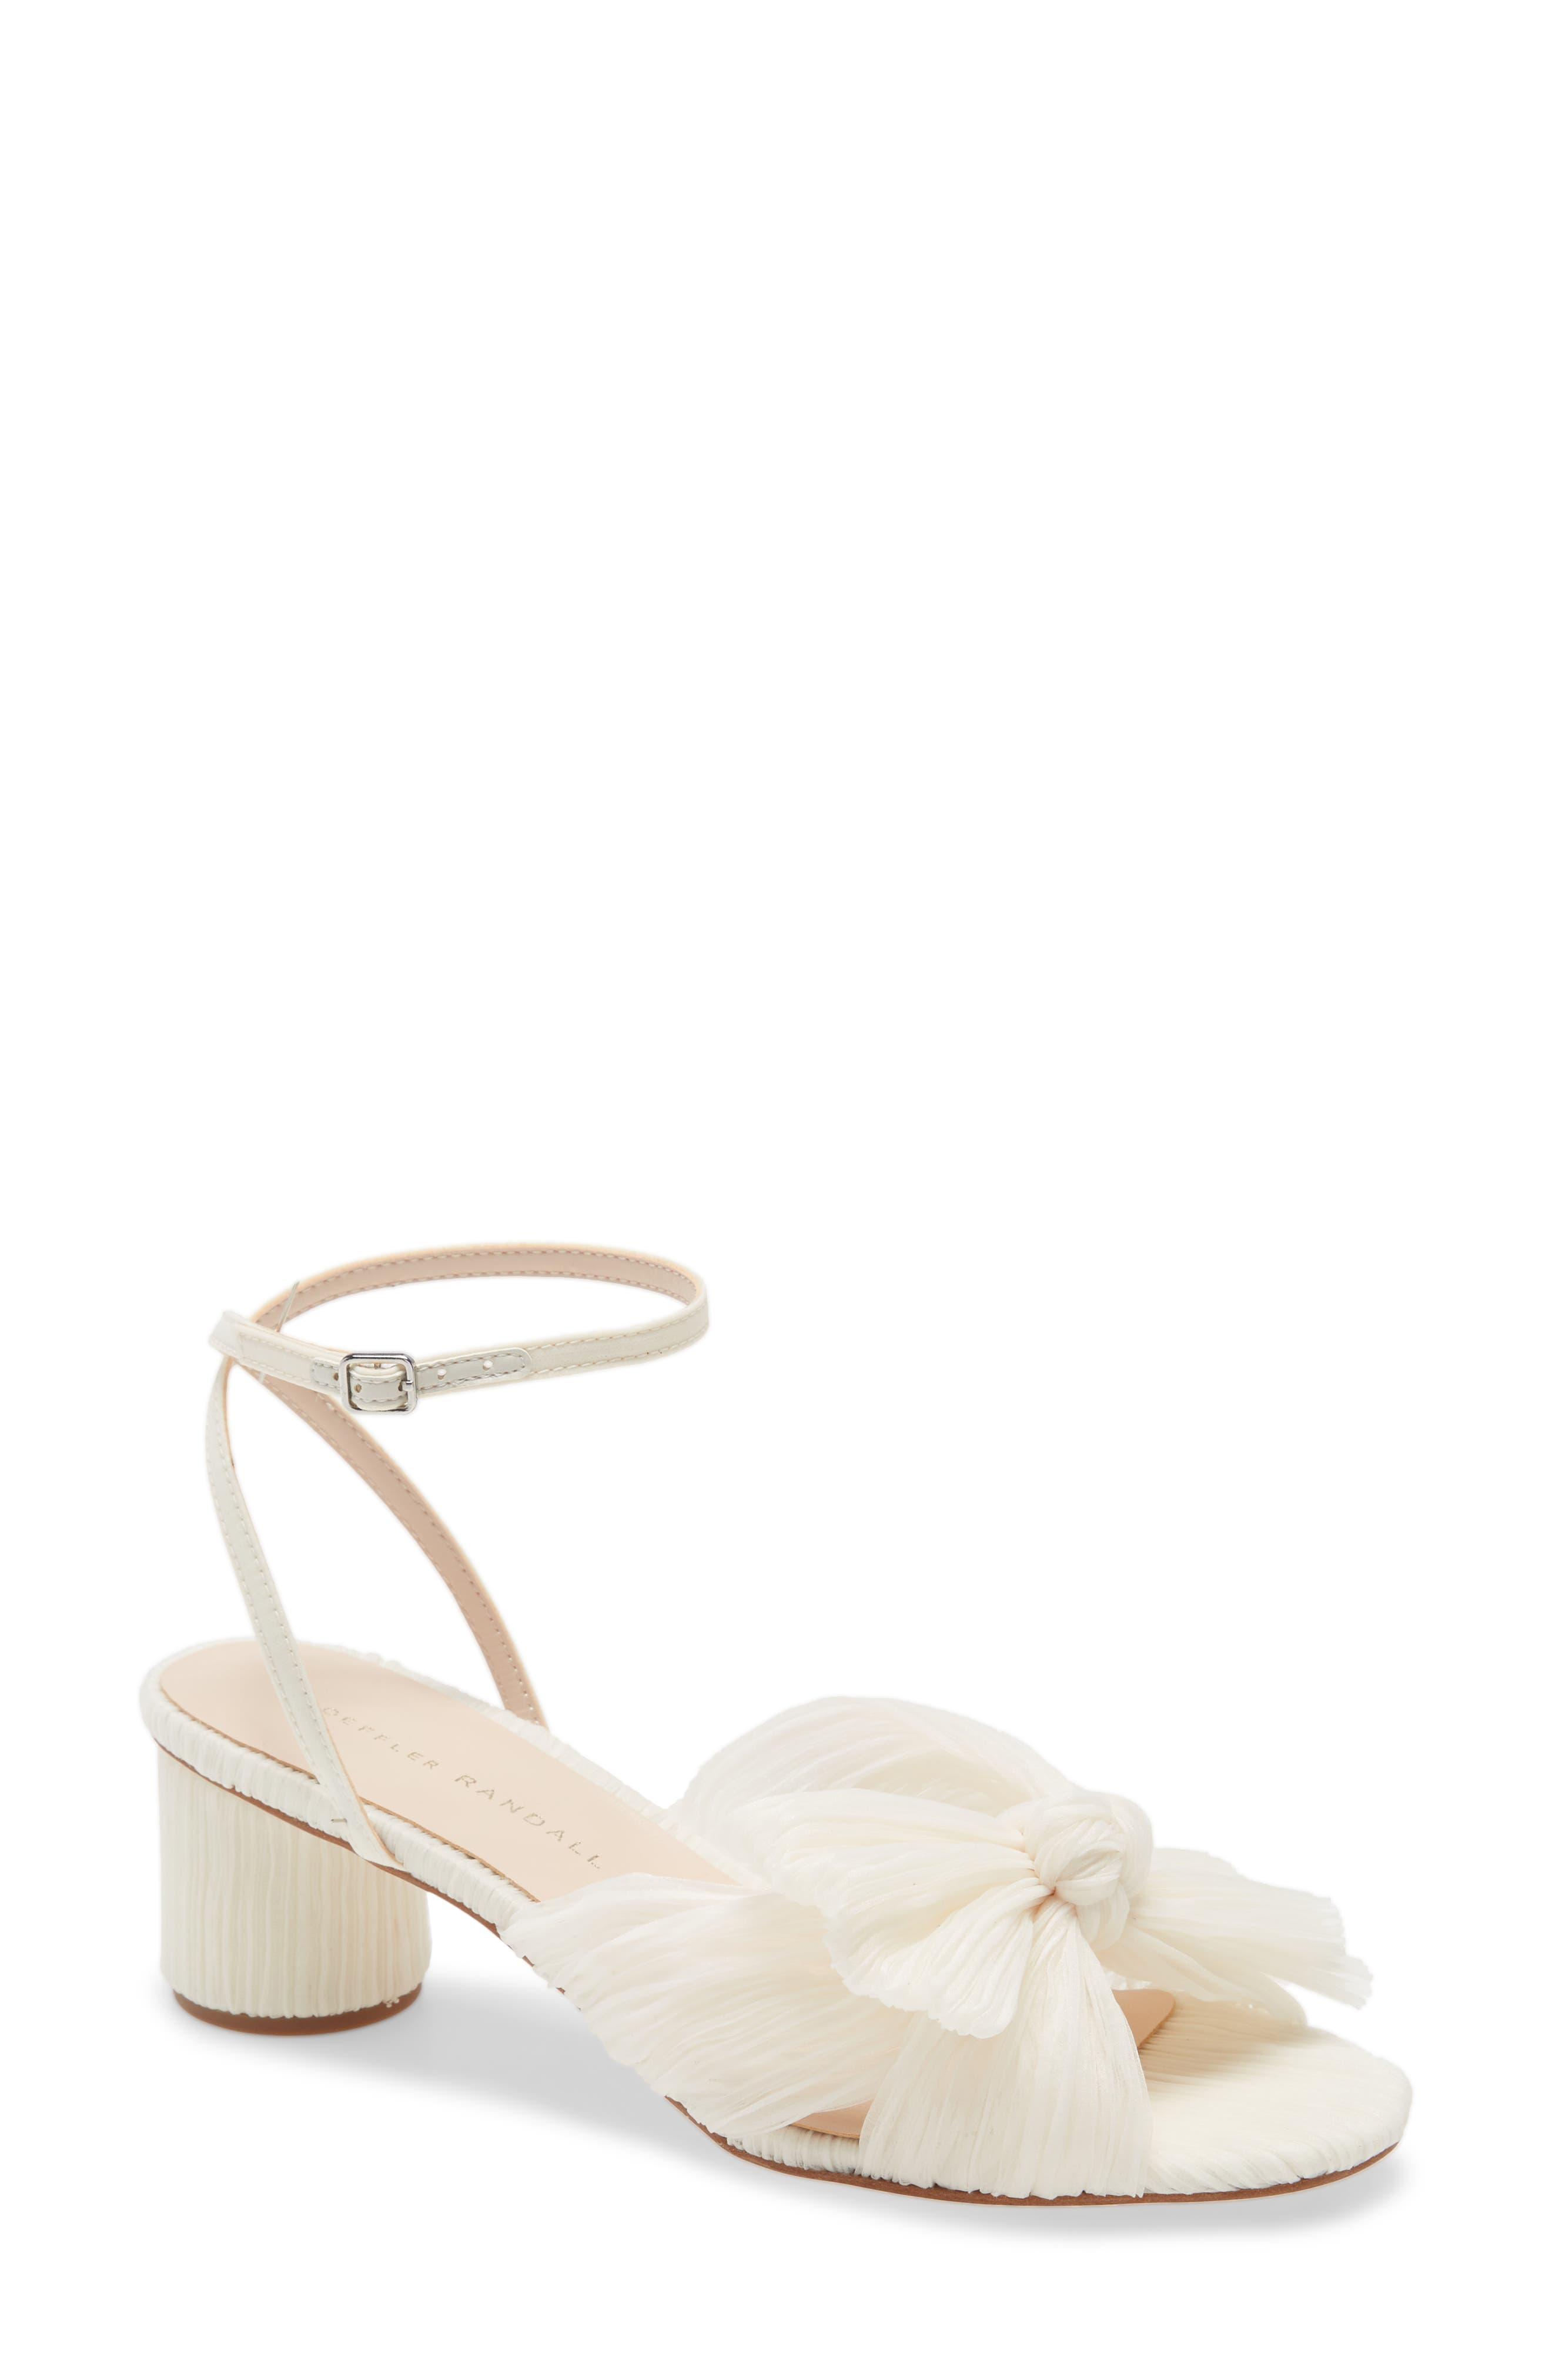 Dahlia Knotted Sandal